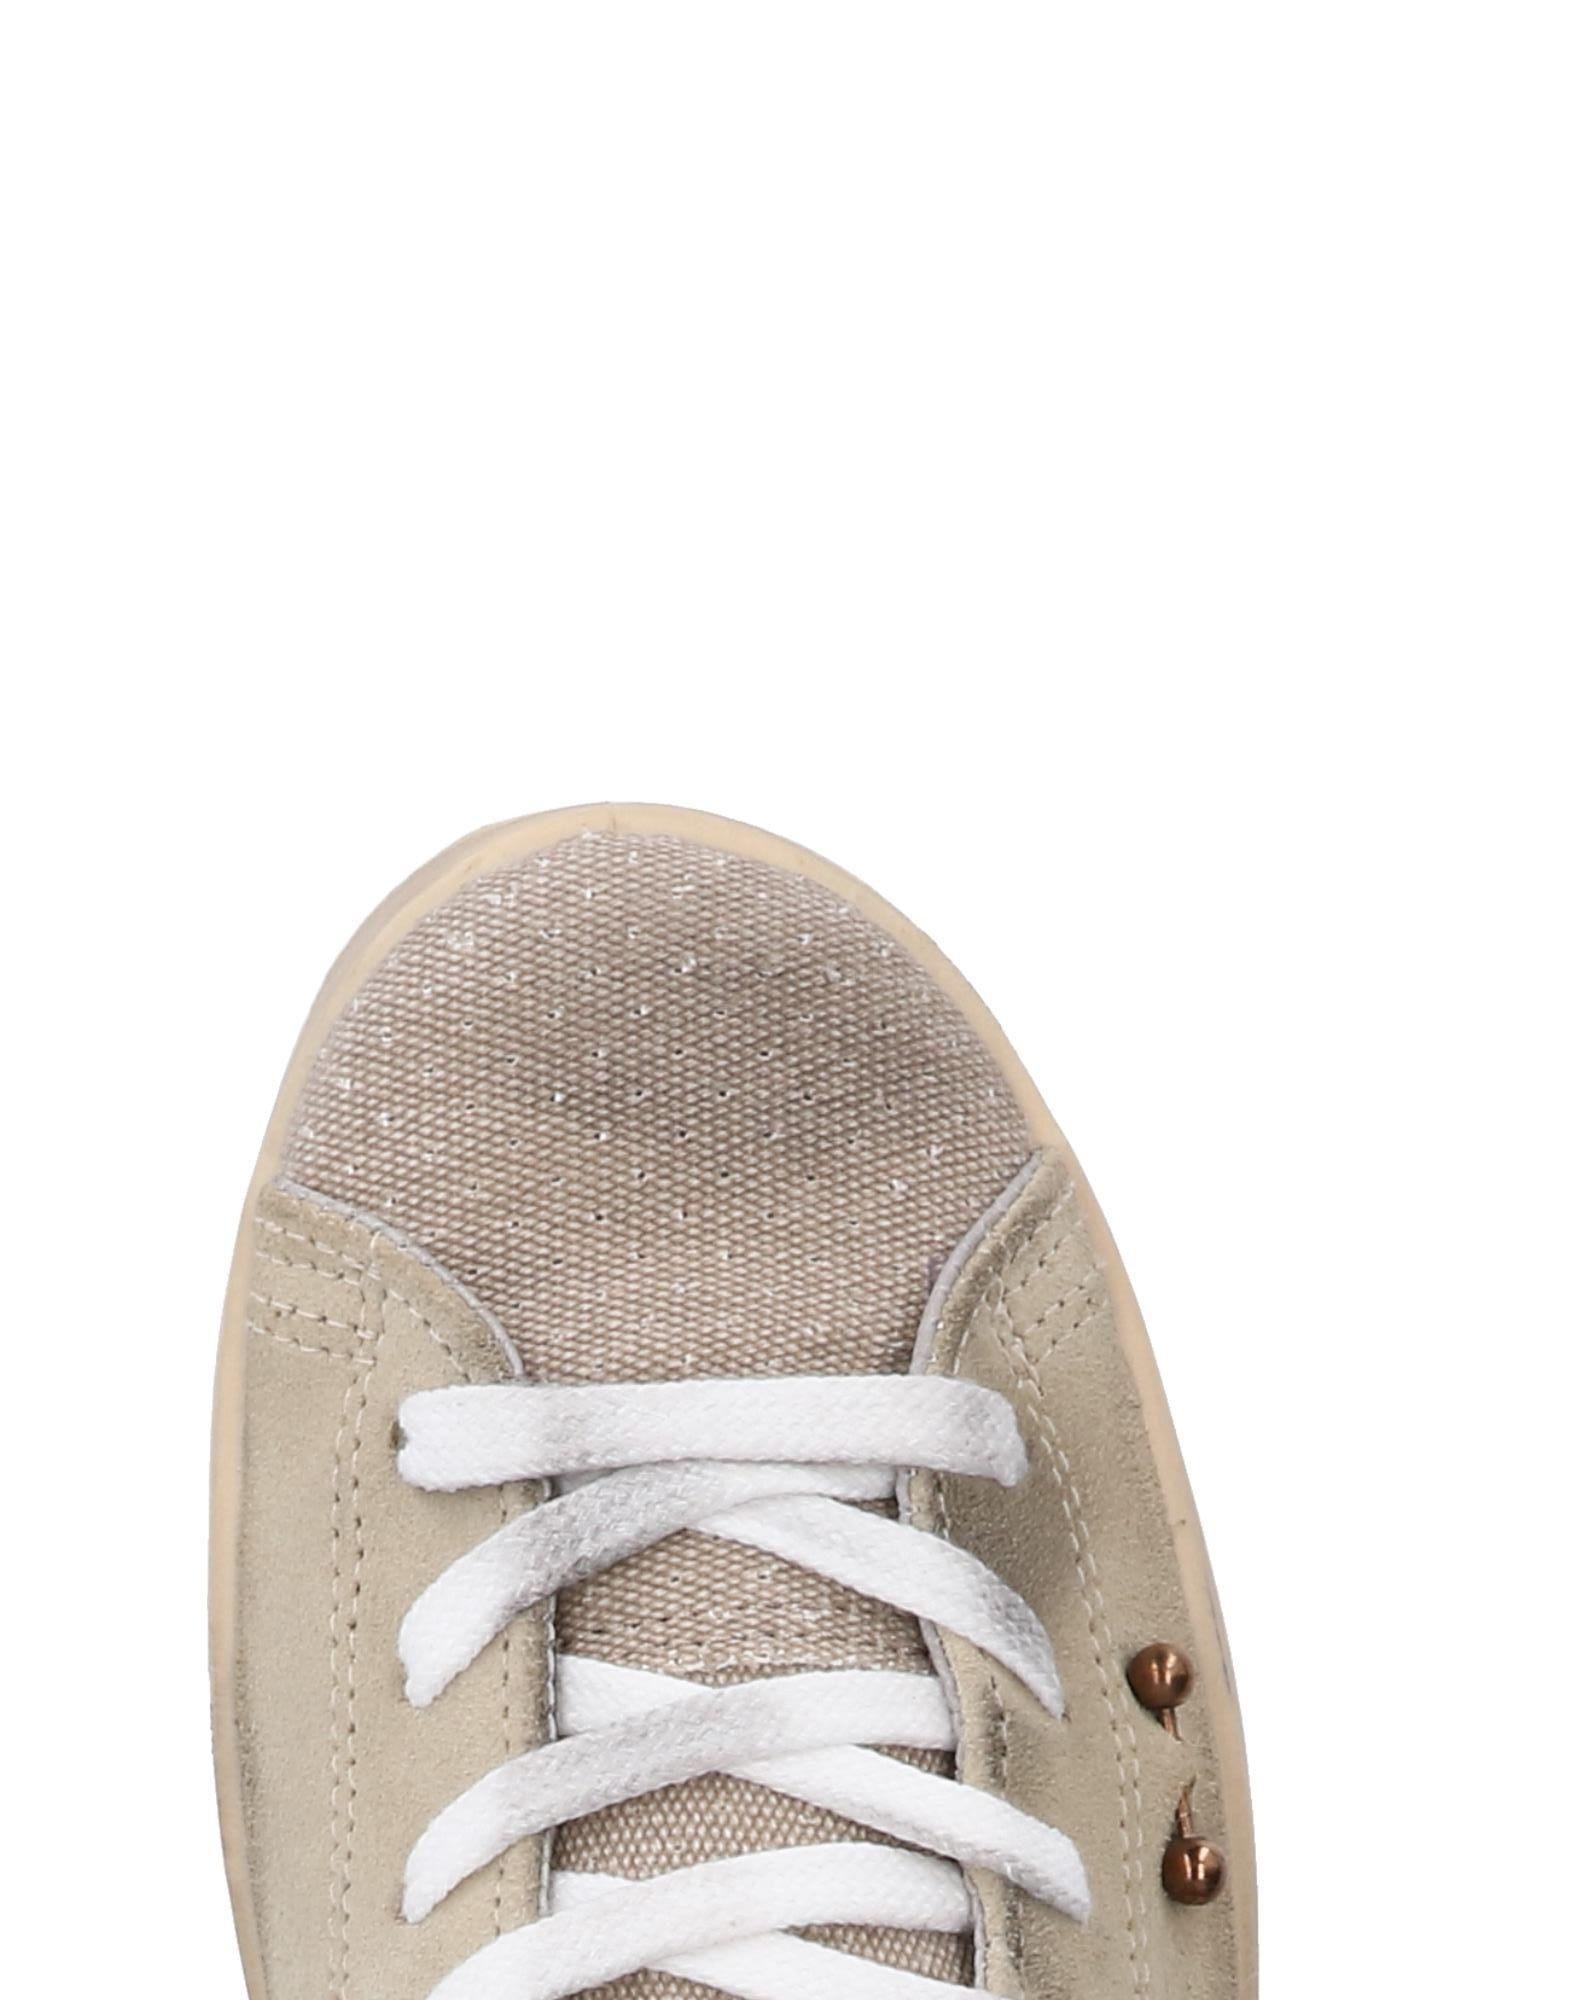 Beverly Hills Polo Club Sneakers Damen  11483733EP Gute Qualität beliebte Schuhe